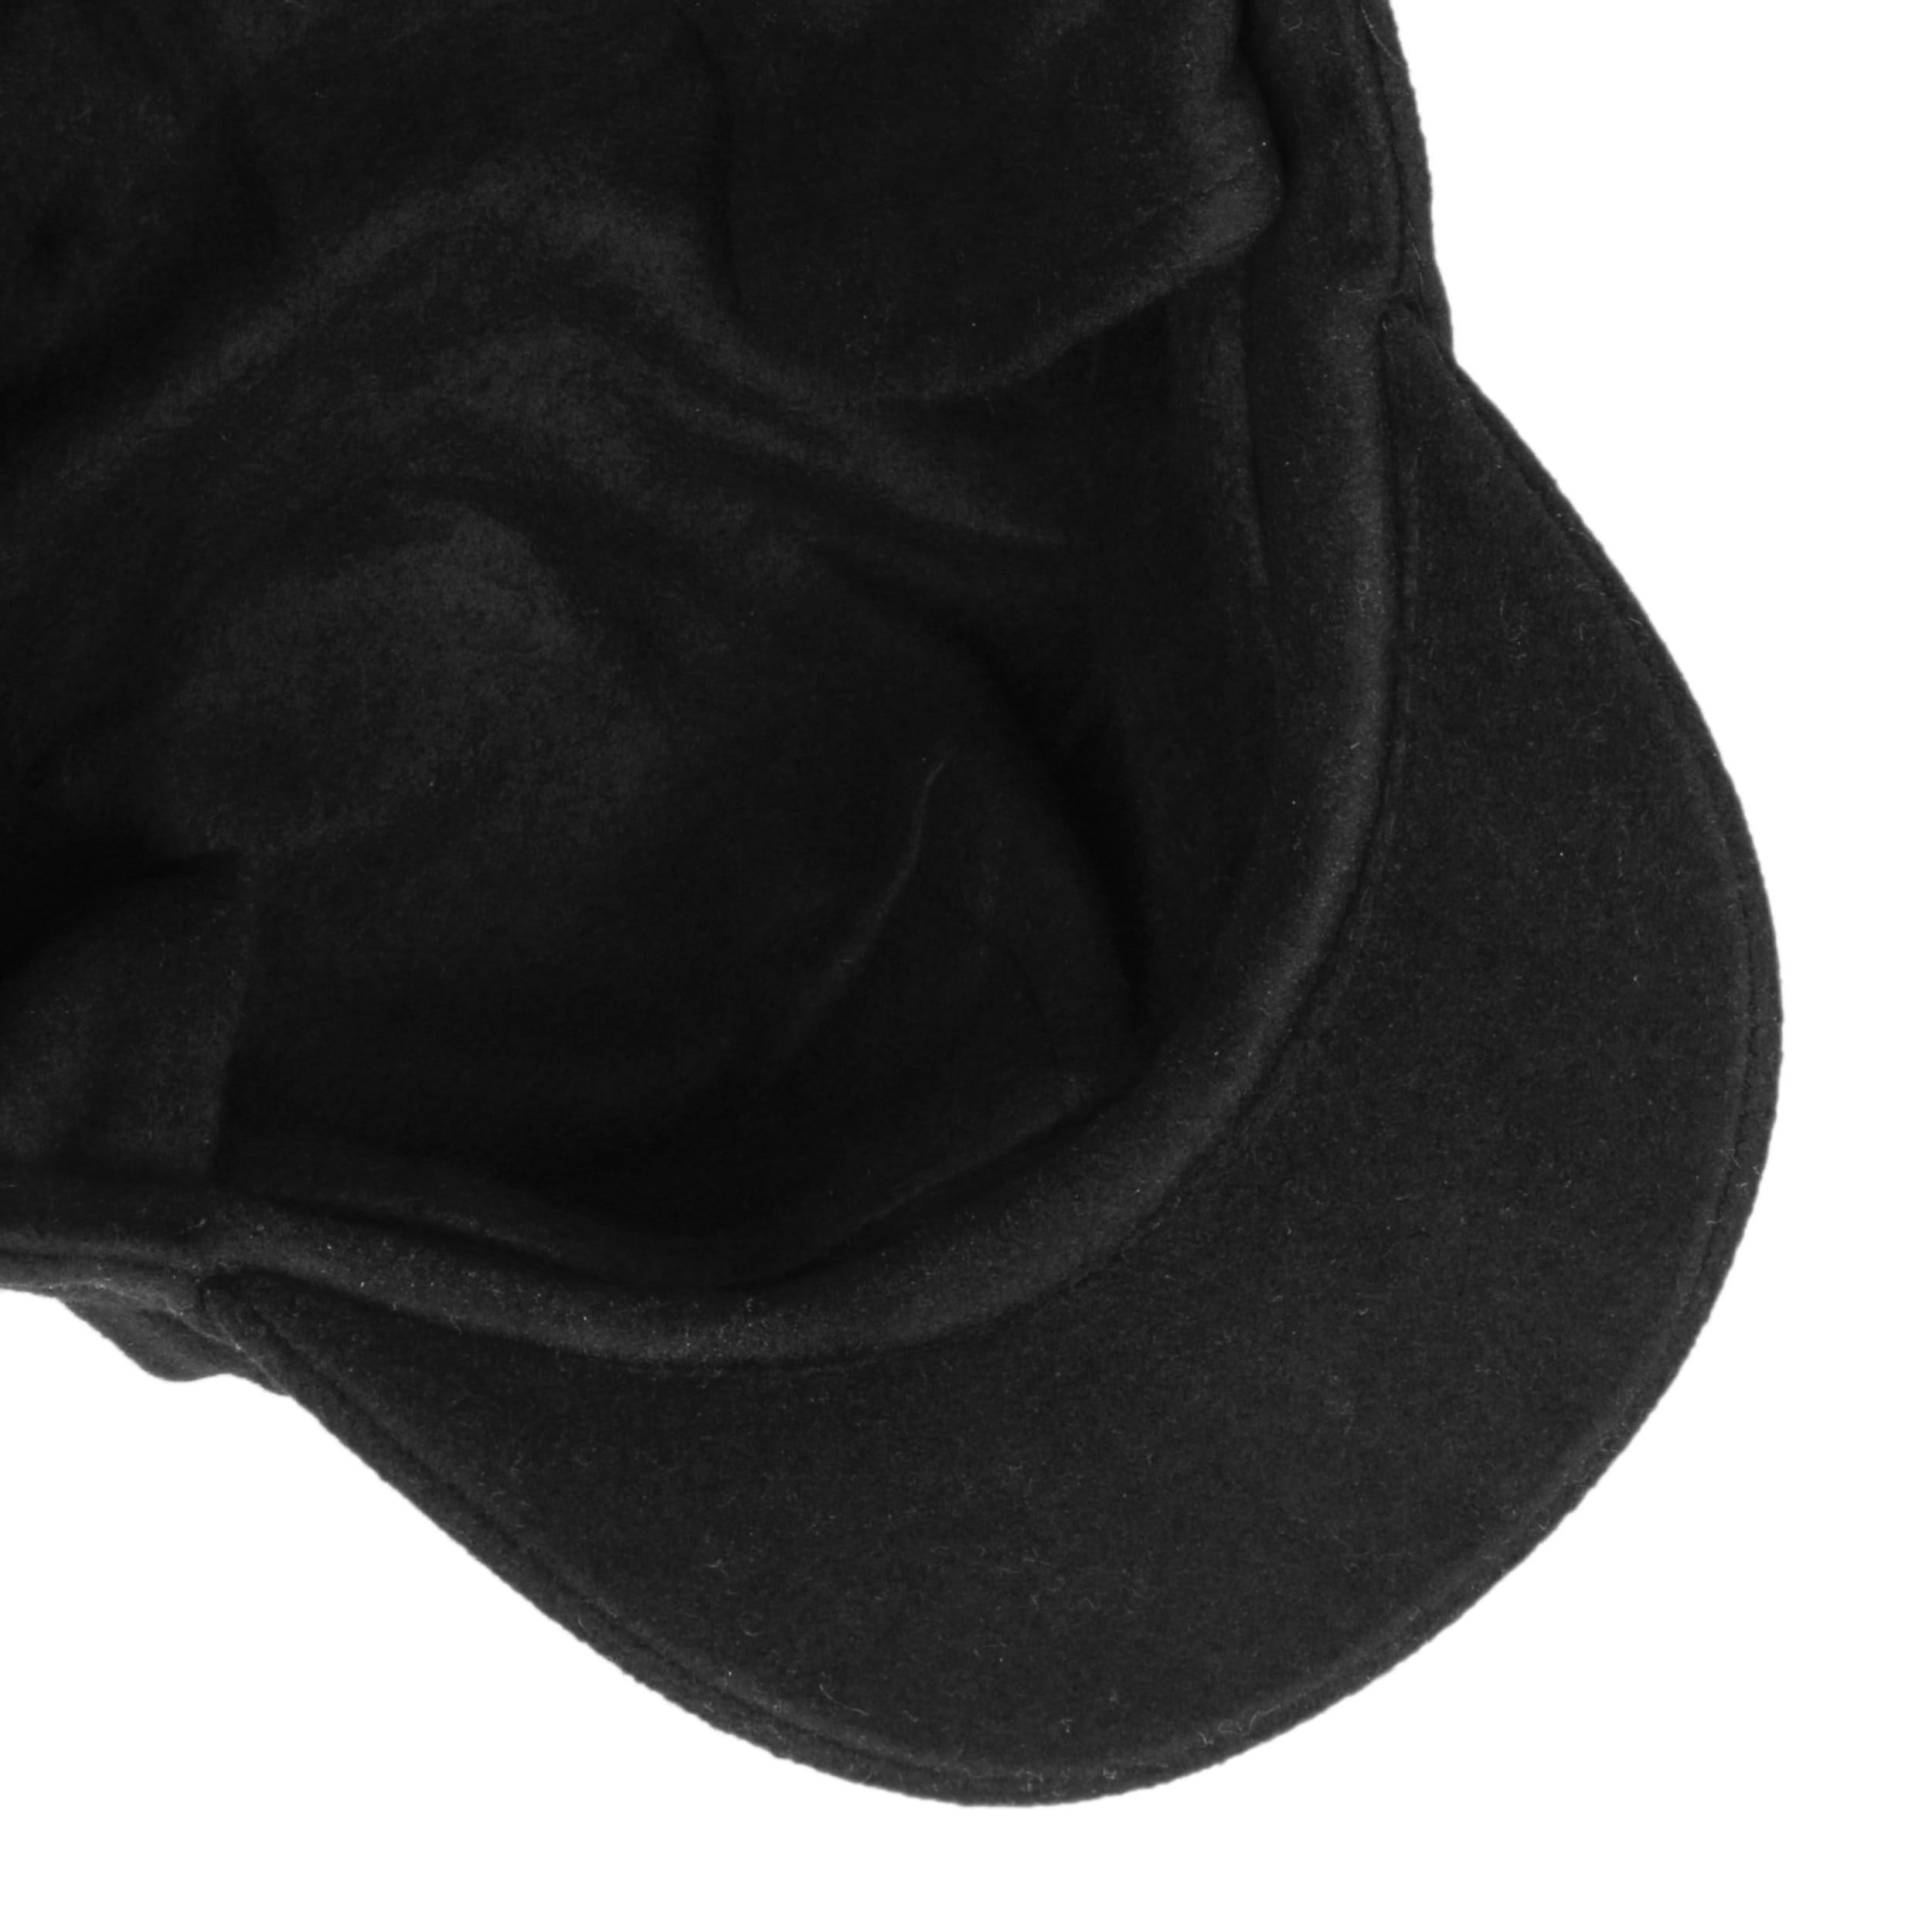 ... Liseta Newsboy Cap with Ear Flaps by Lipodo - black 2 ... db883515a09